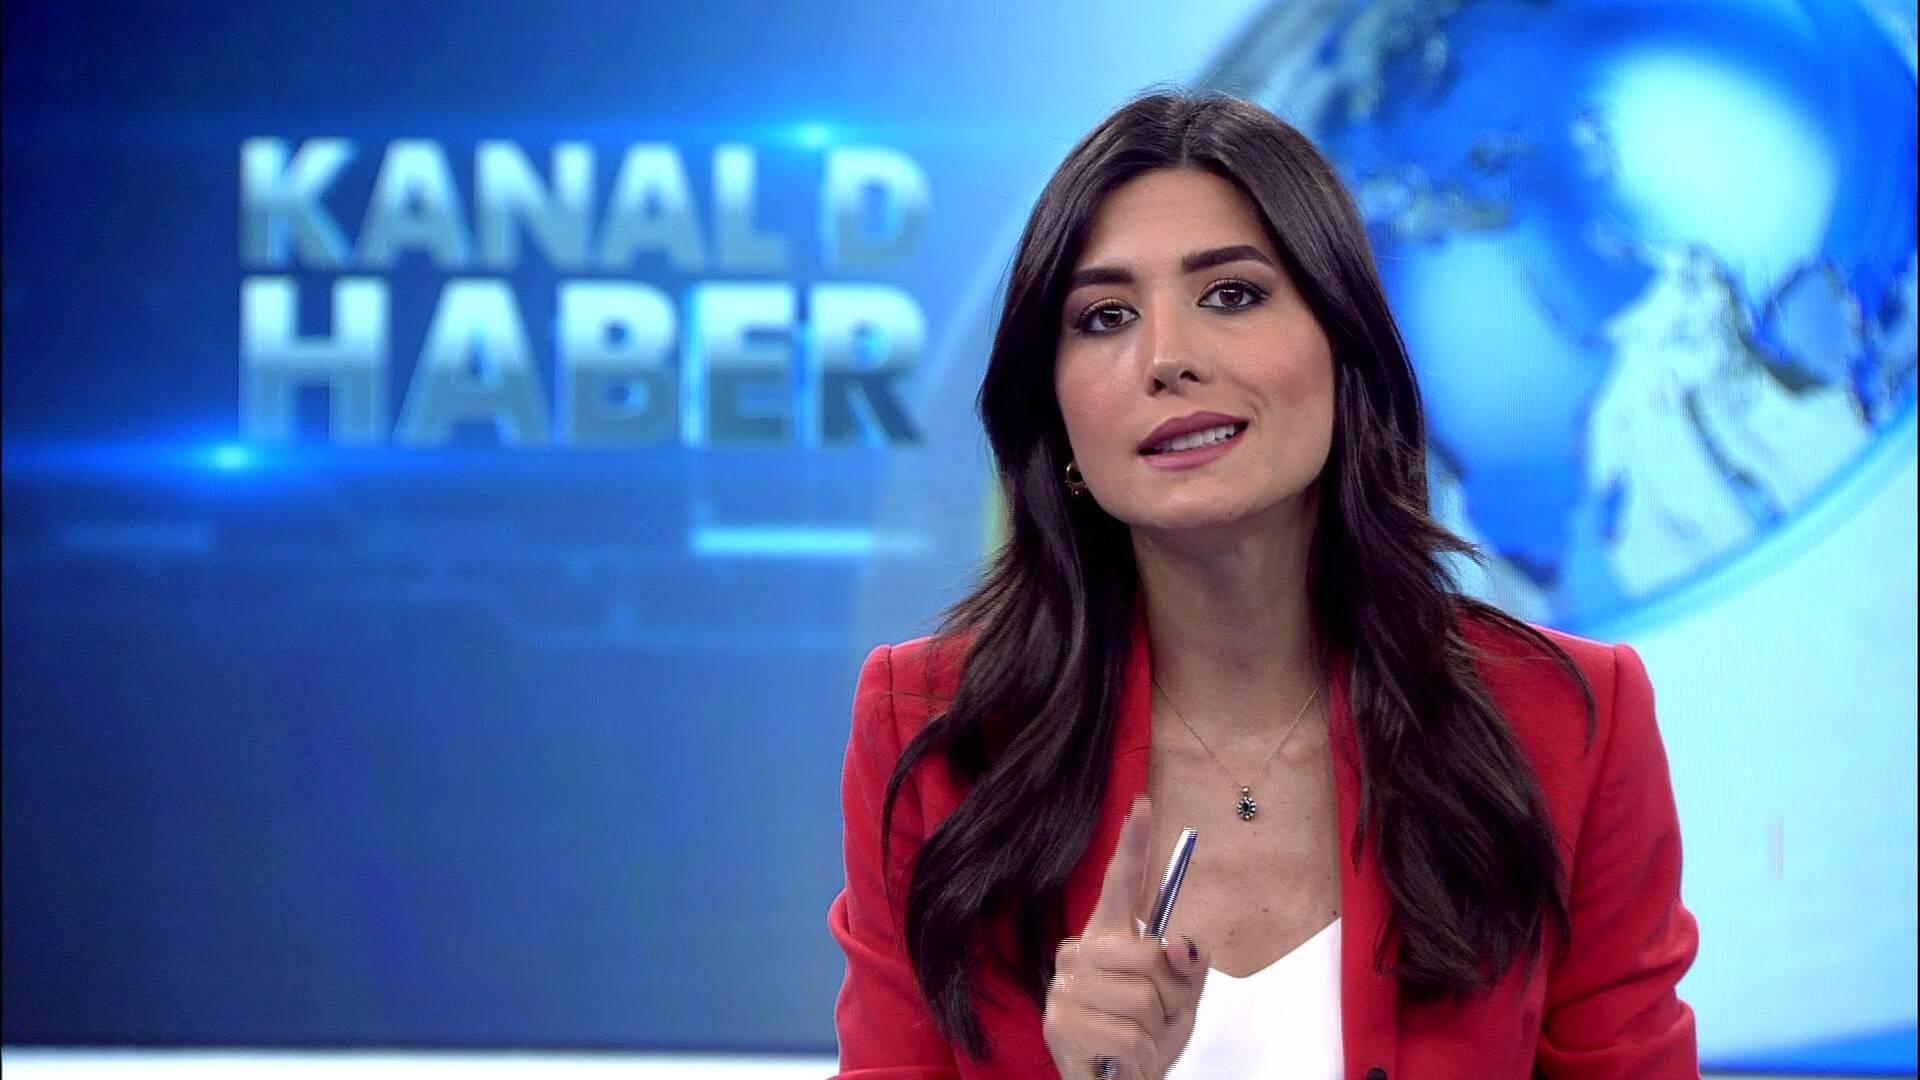 Kanal D Haber - 20.07.2017